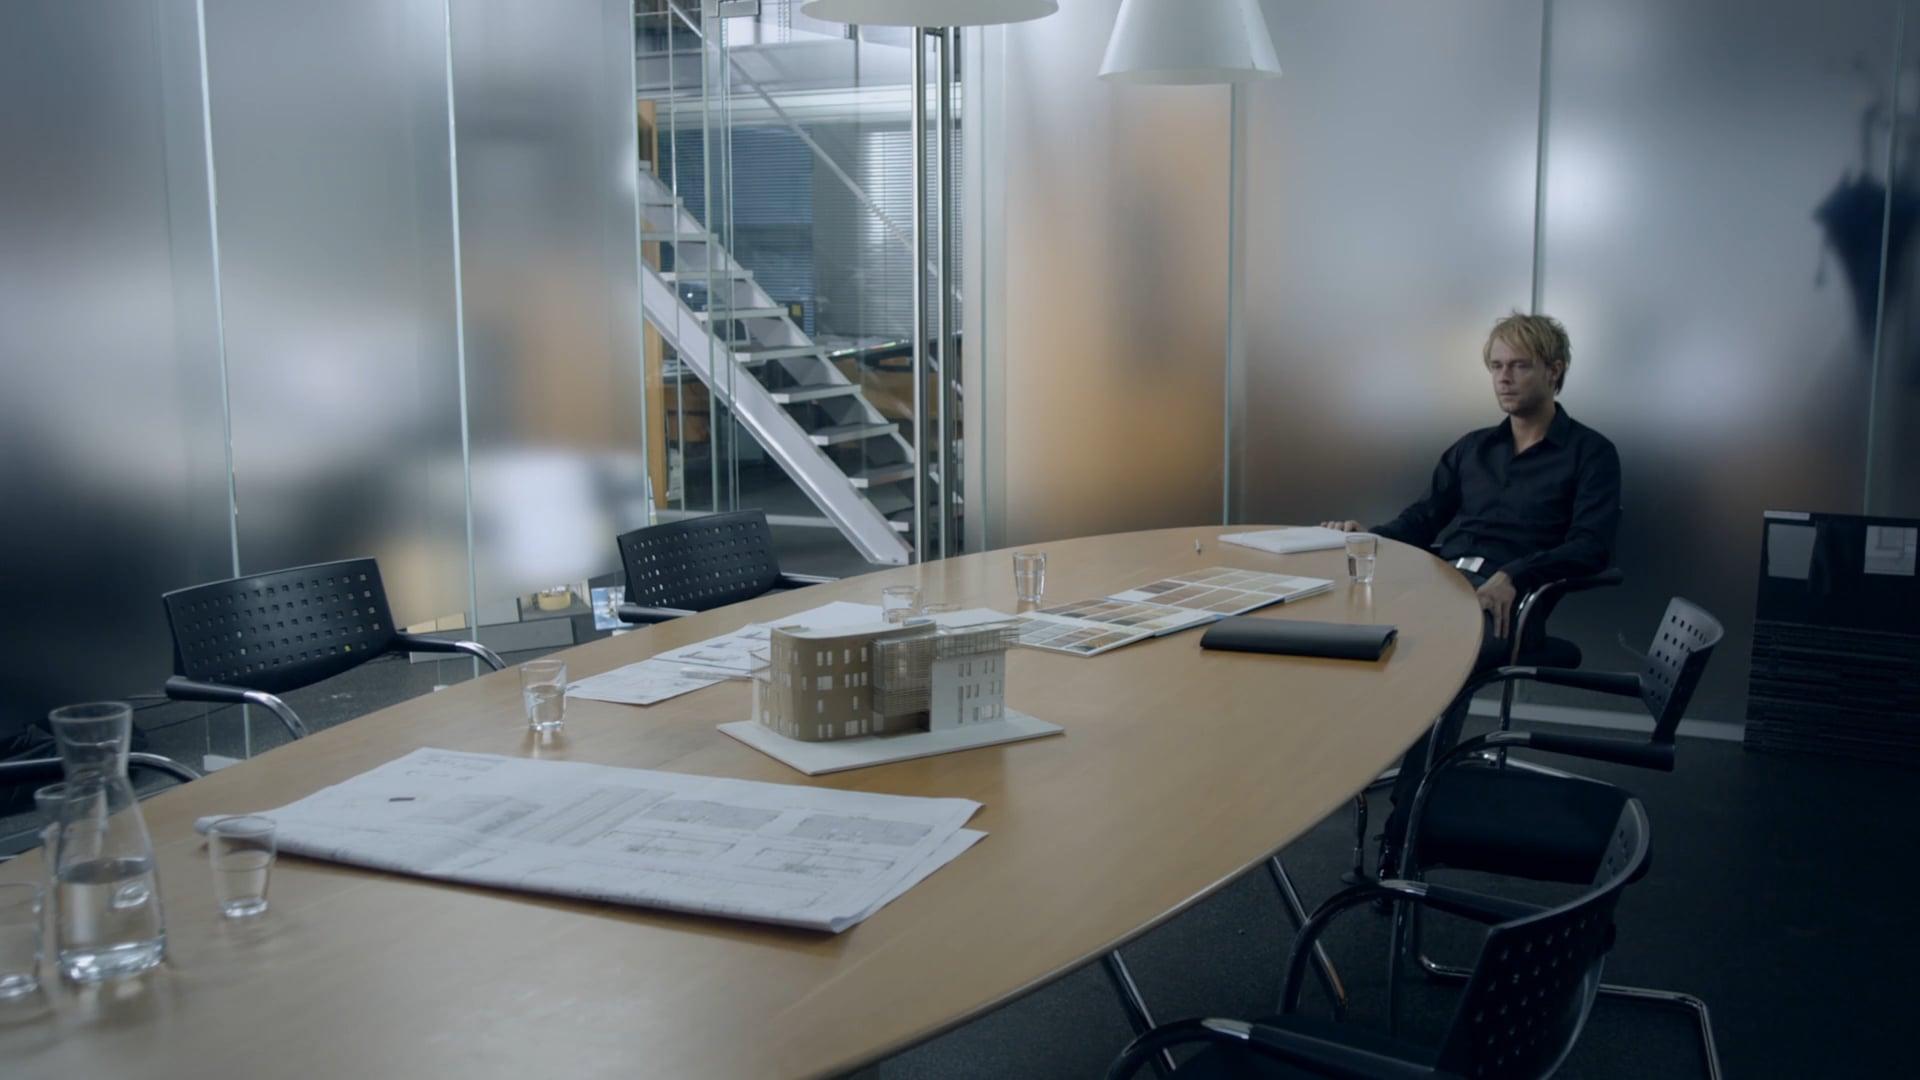 Meester - Trailer (Eindexamenfilm NFTA 2011)